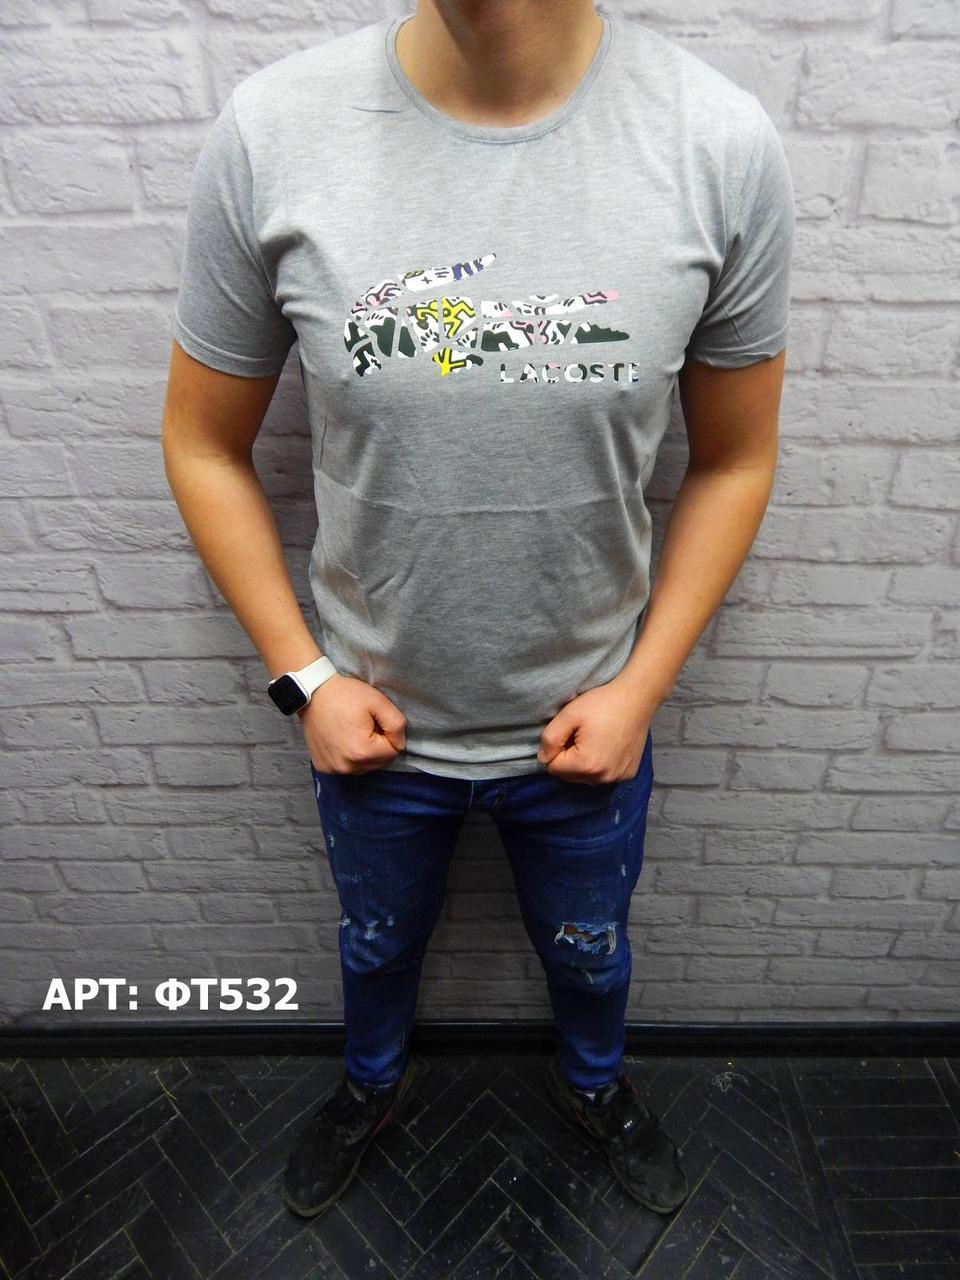 Мужская футболка Lacoste. Размеры: M, L, XL, 2XL